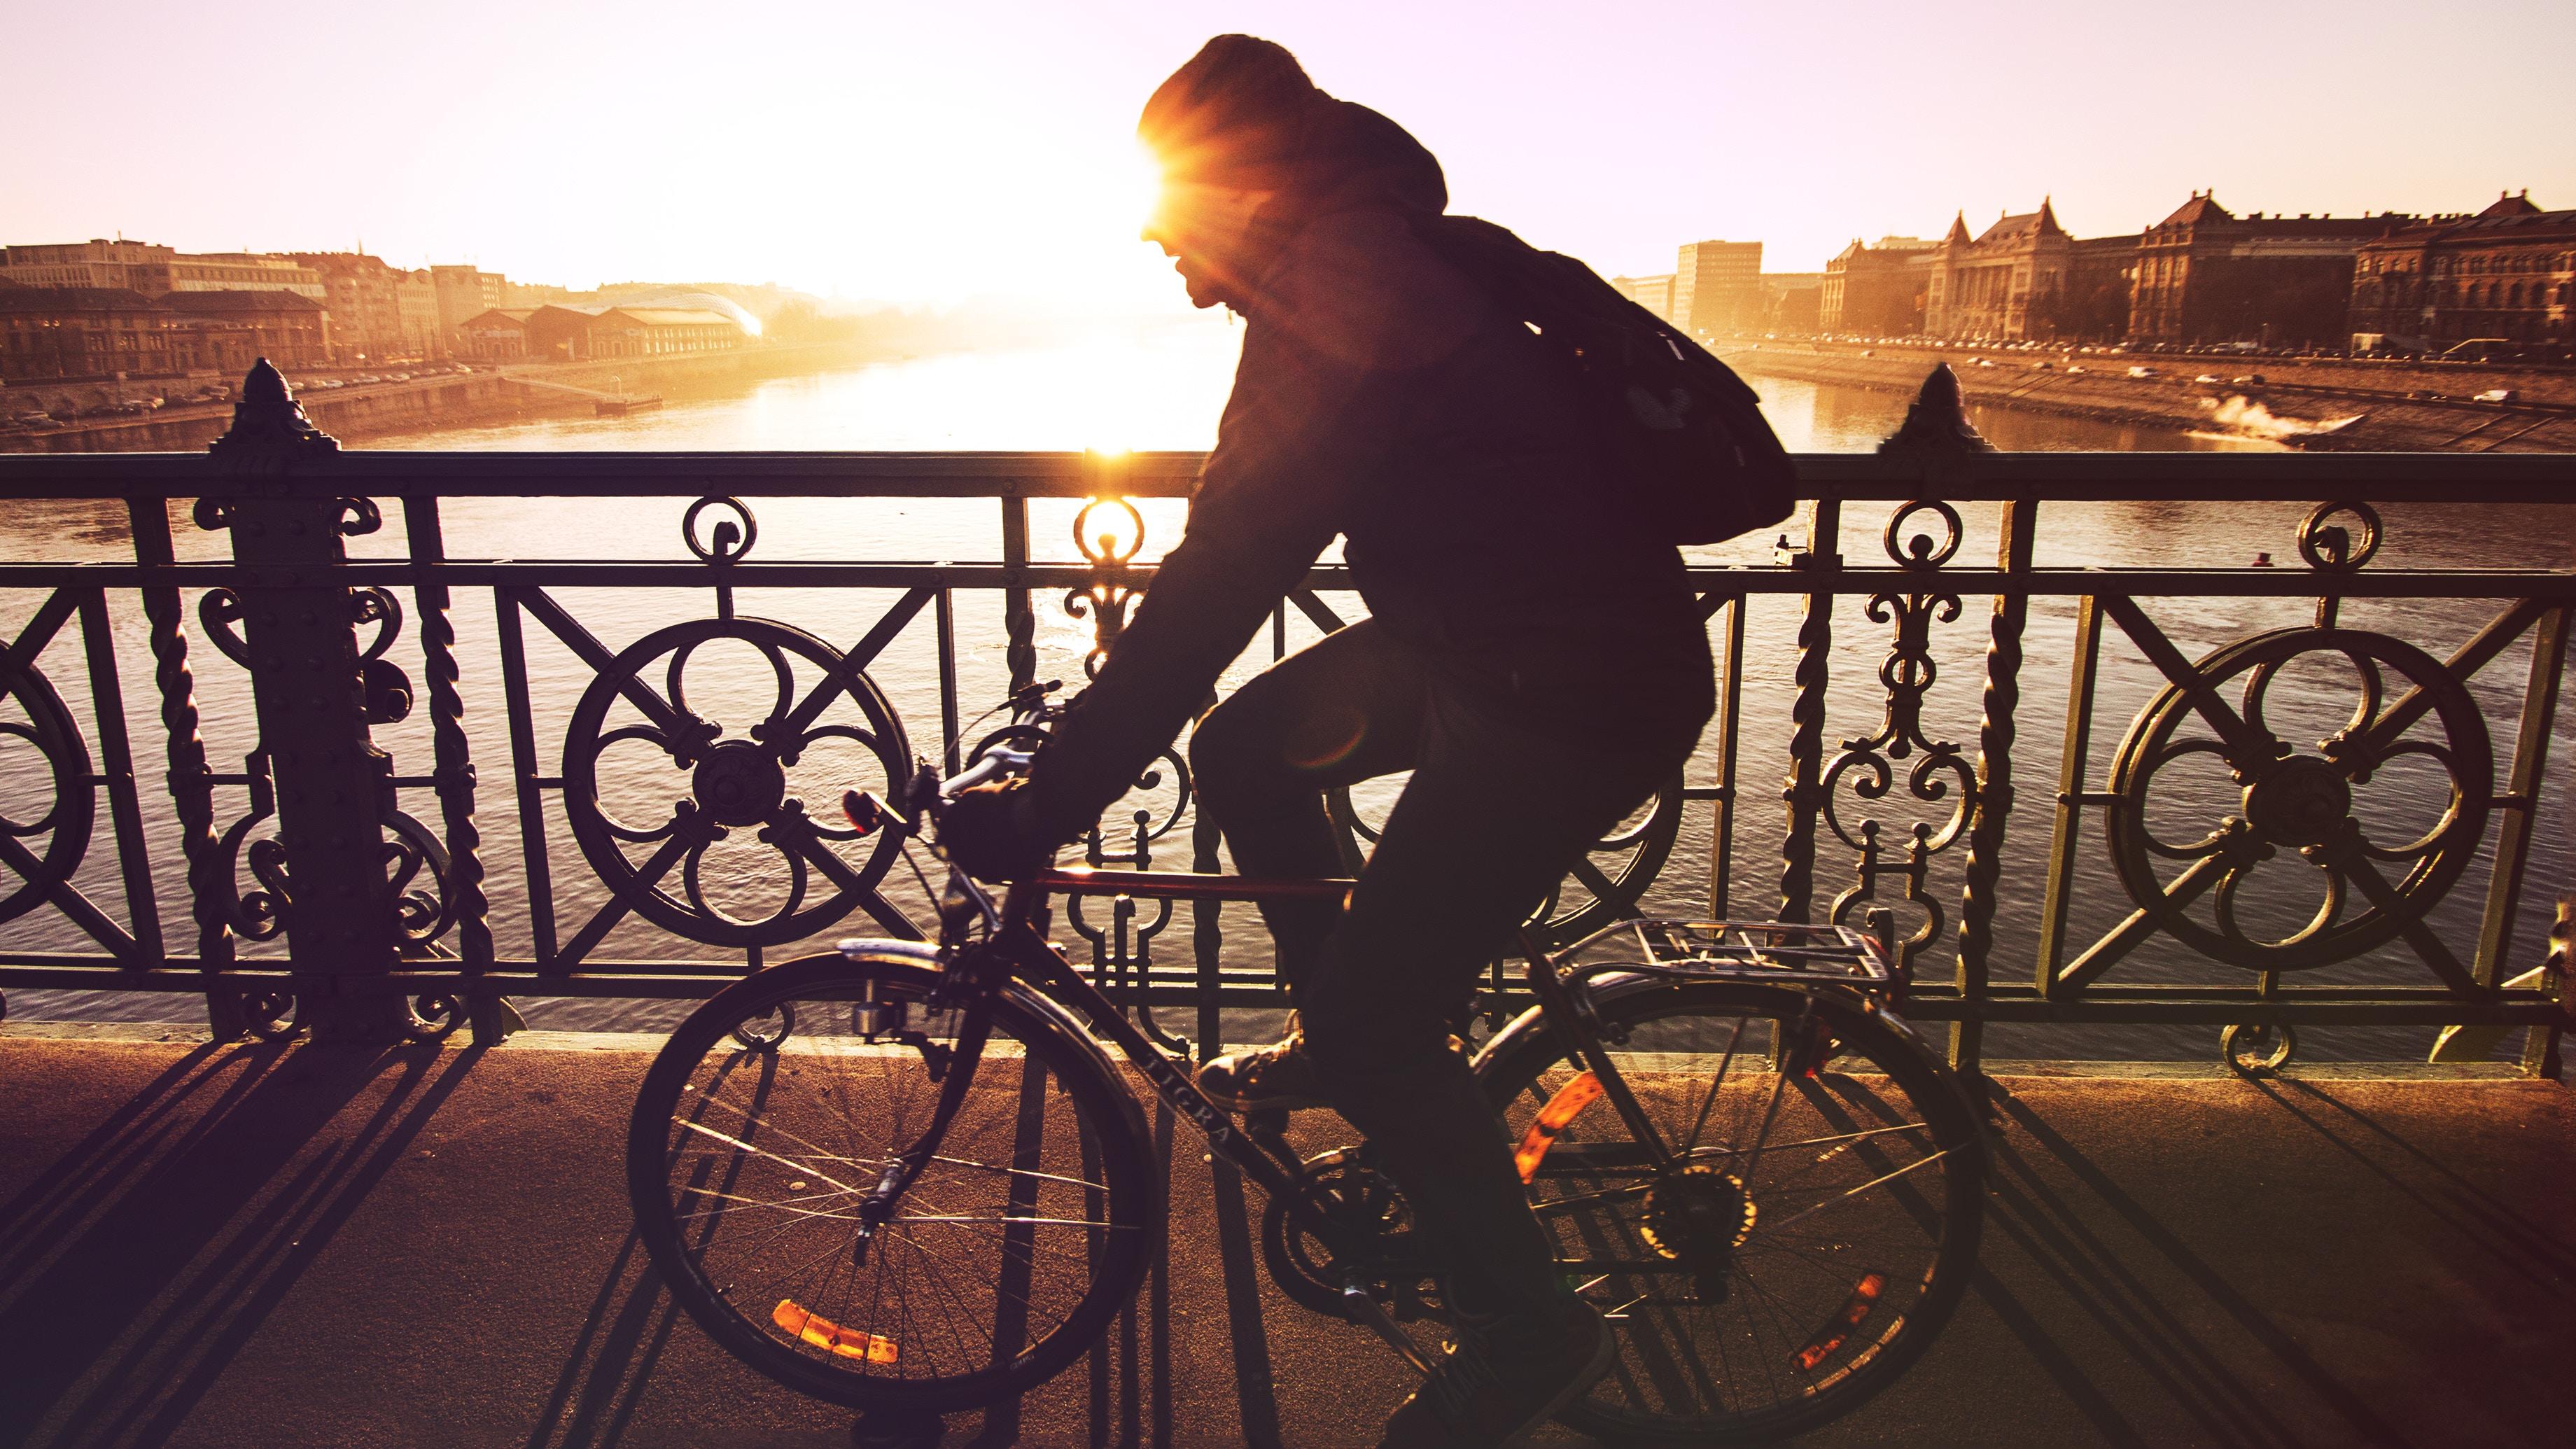 An image of a man on a bike